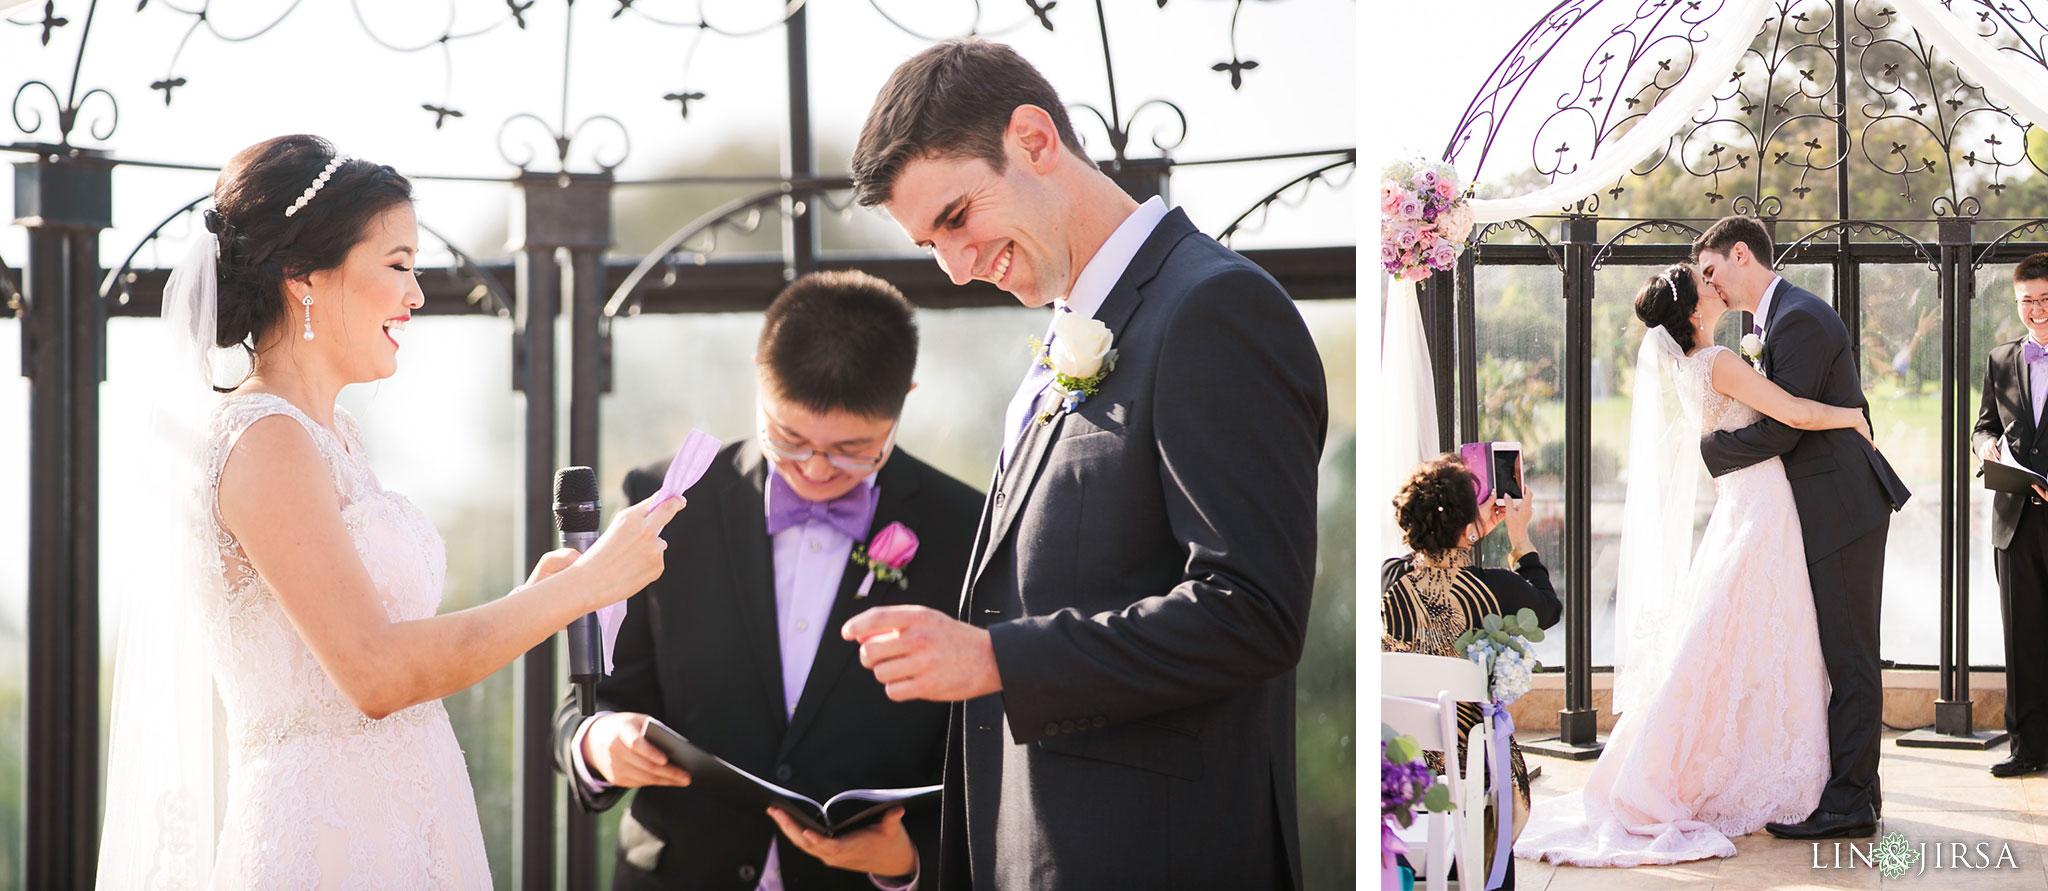 18 seacliff country club huntington beach wedding photography